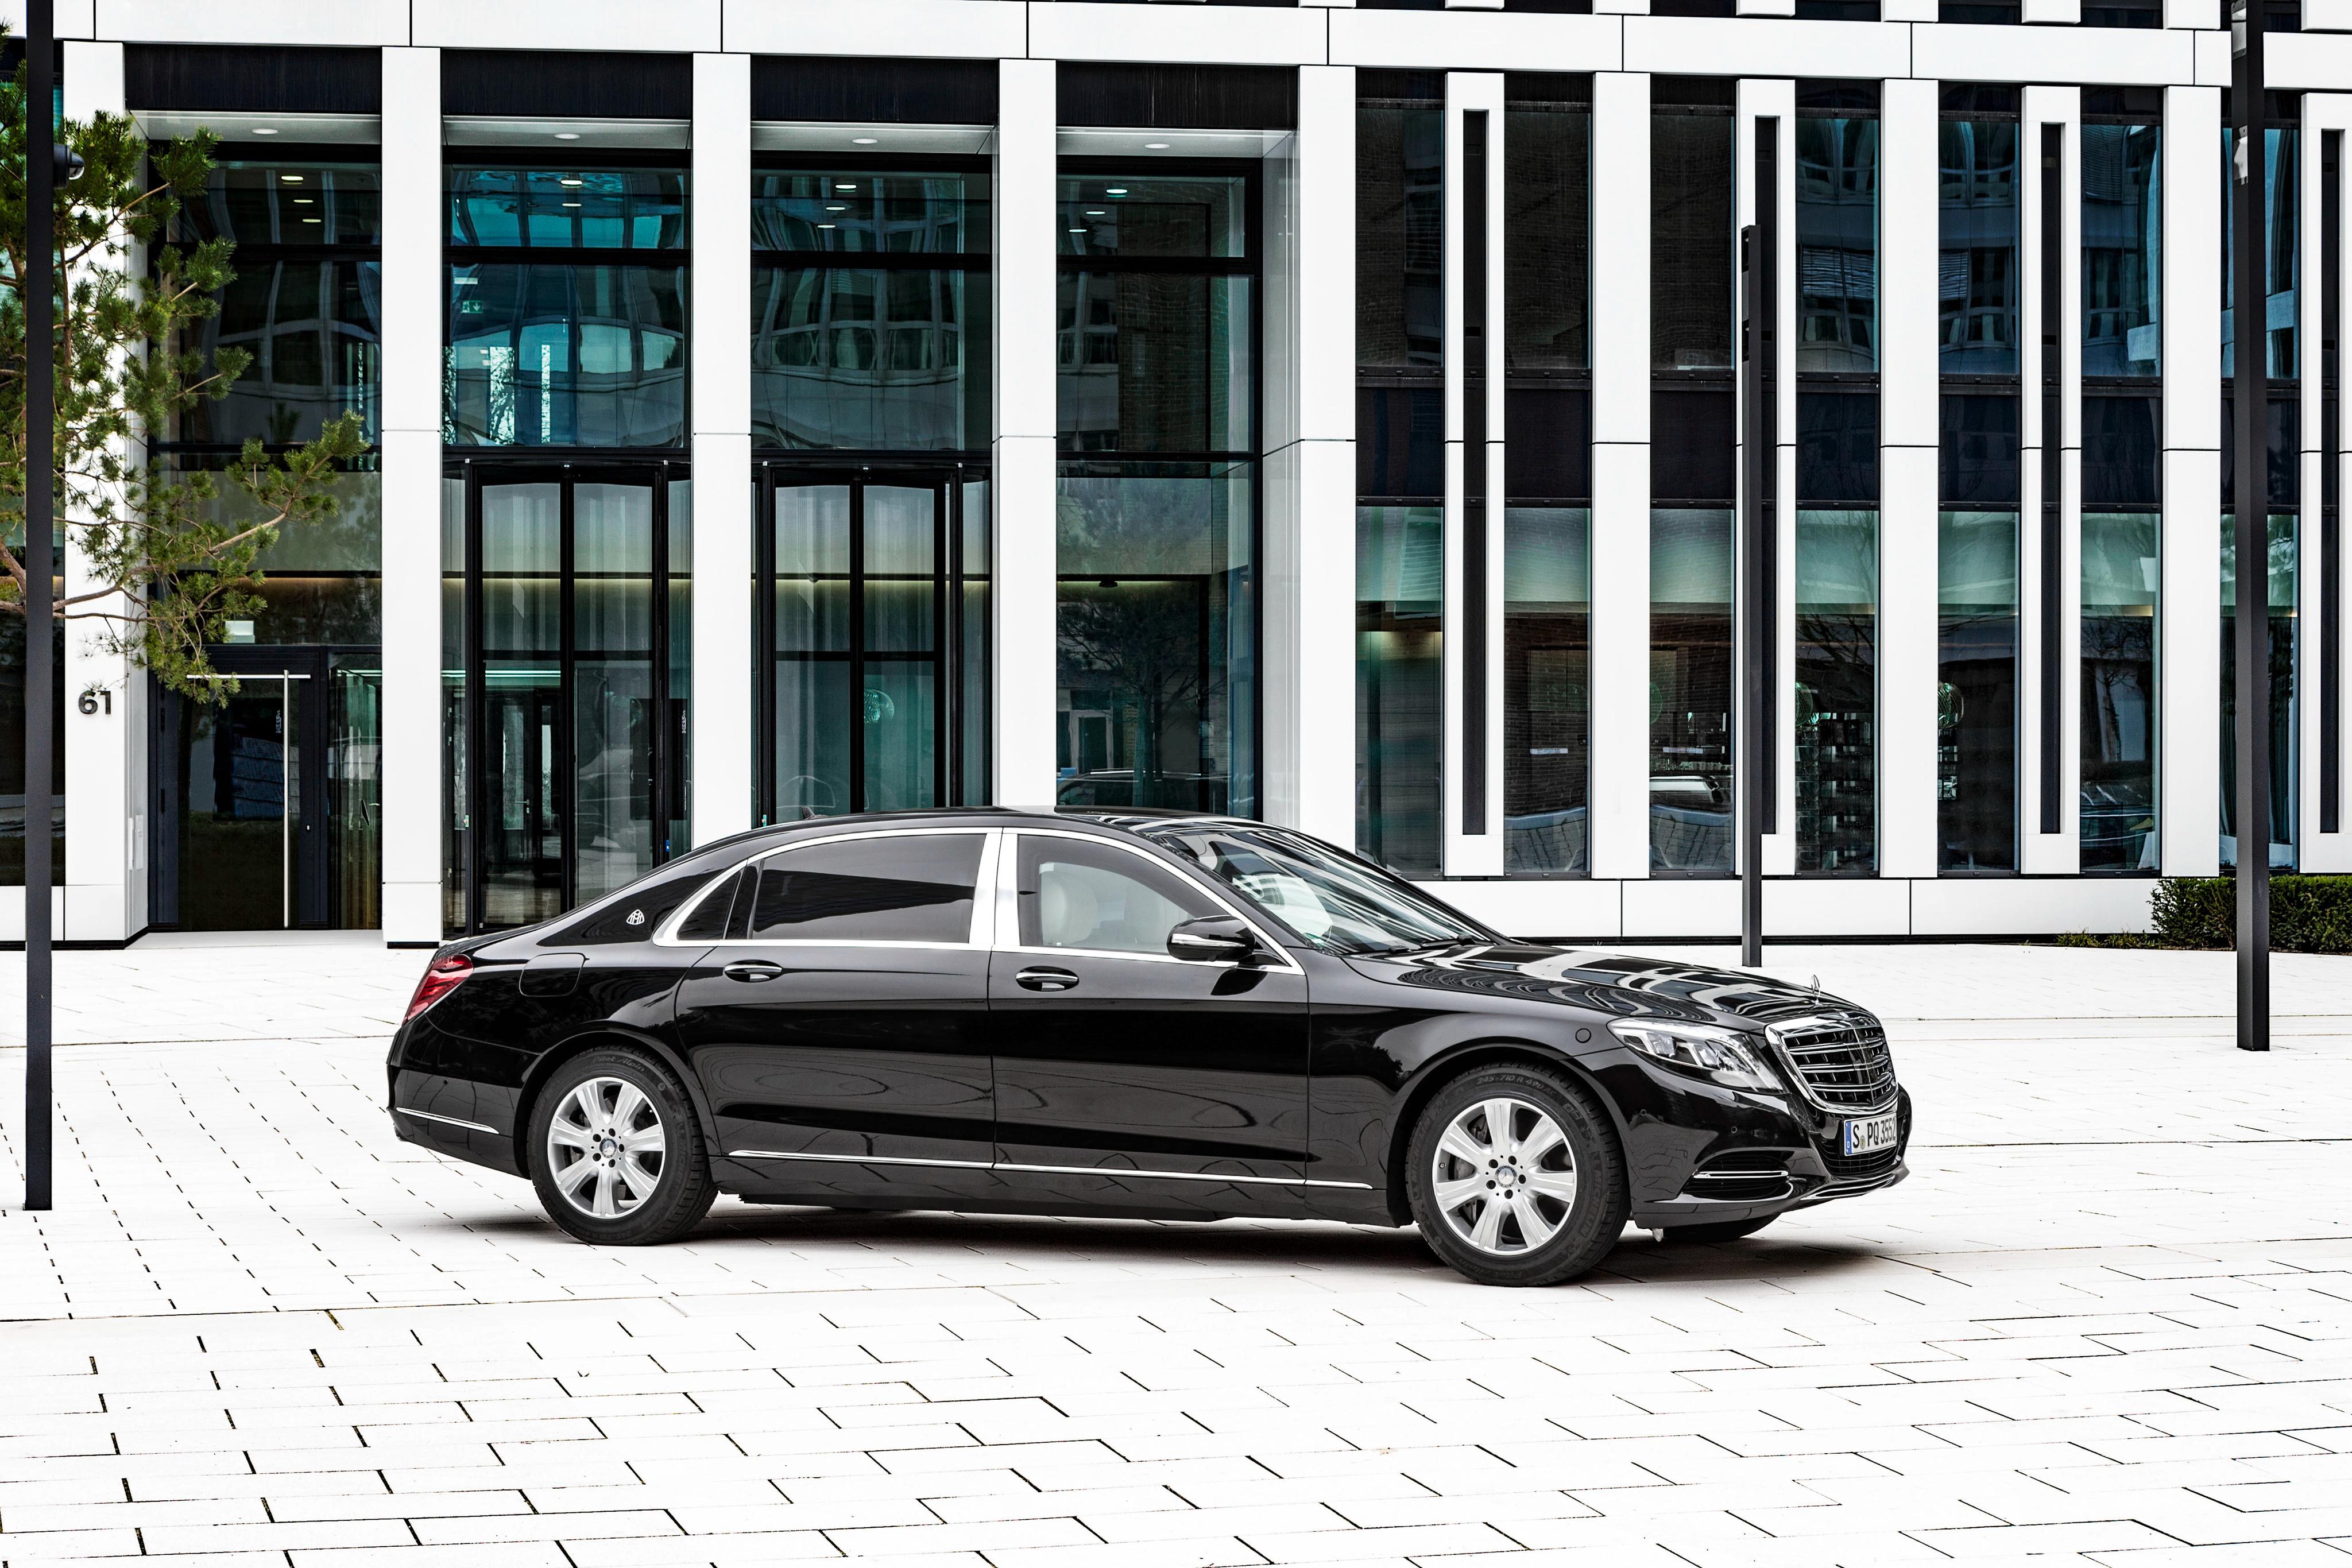 Black Car Car Luxury Car Mercedes Benz Mercedes Benz S Class Vehicle 4096x2731